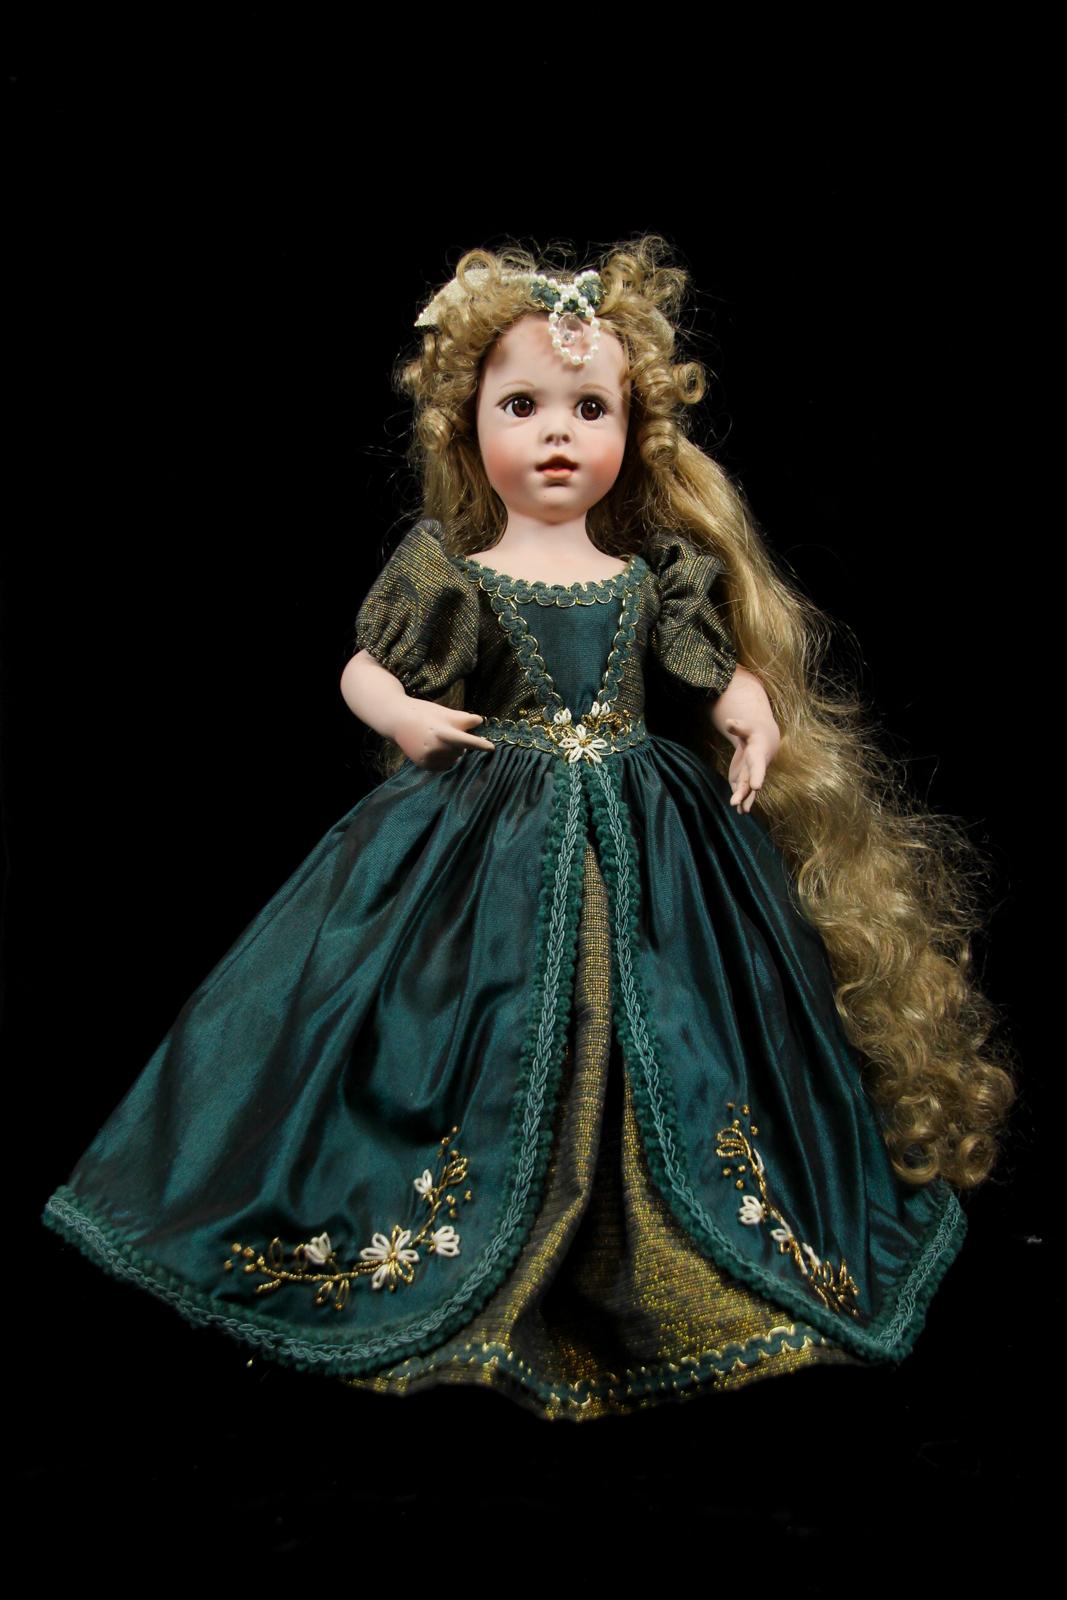 doll bijou brigitte sammlerpuppe baby kim 26 cm porzellan. Black Bedroom Furniture Sets. Home Design Ideas